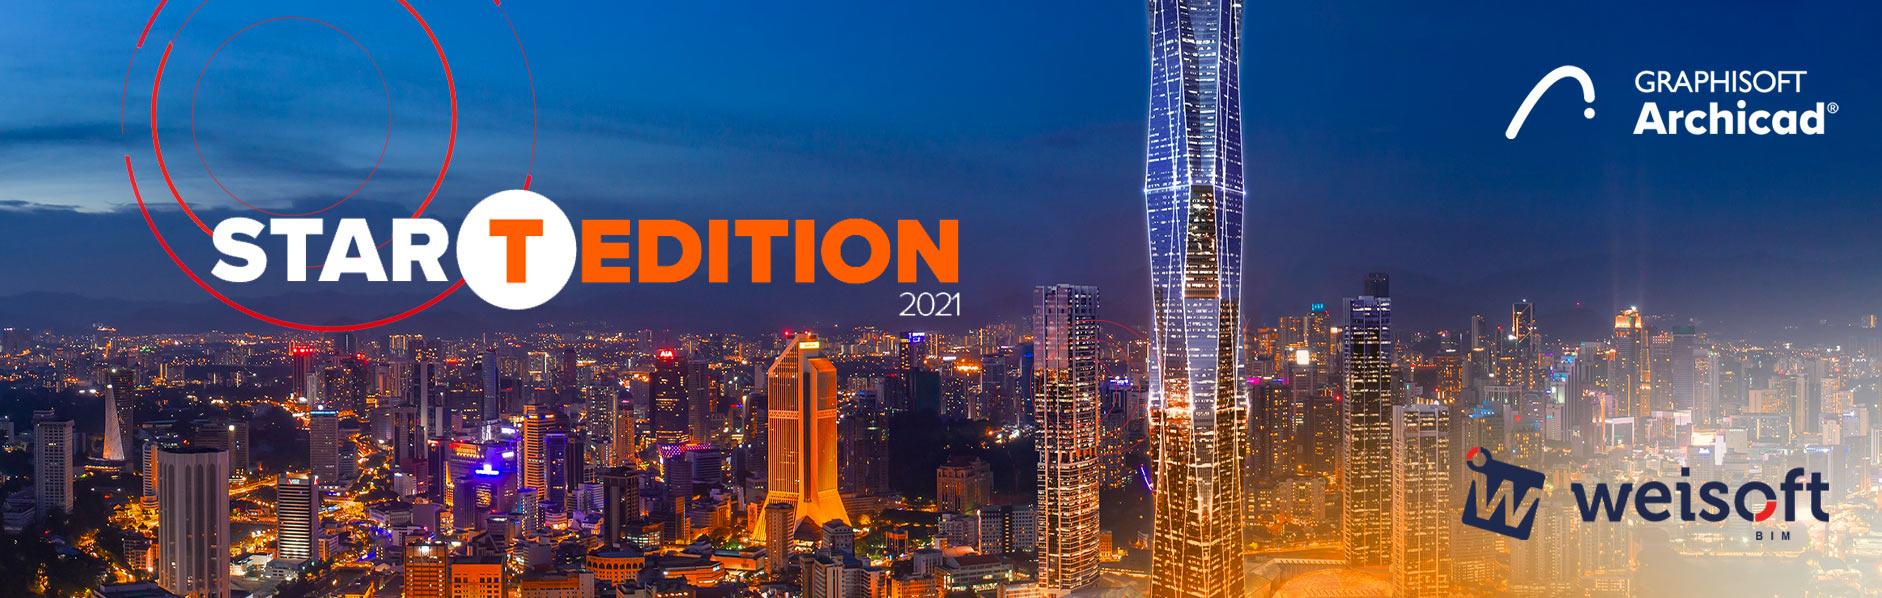 ARCHICAD START EDITION 2021